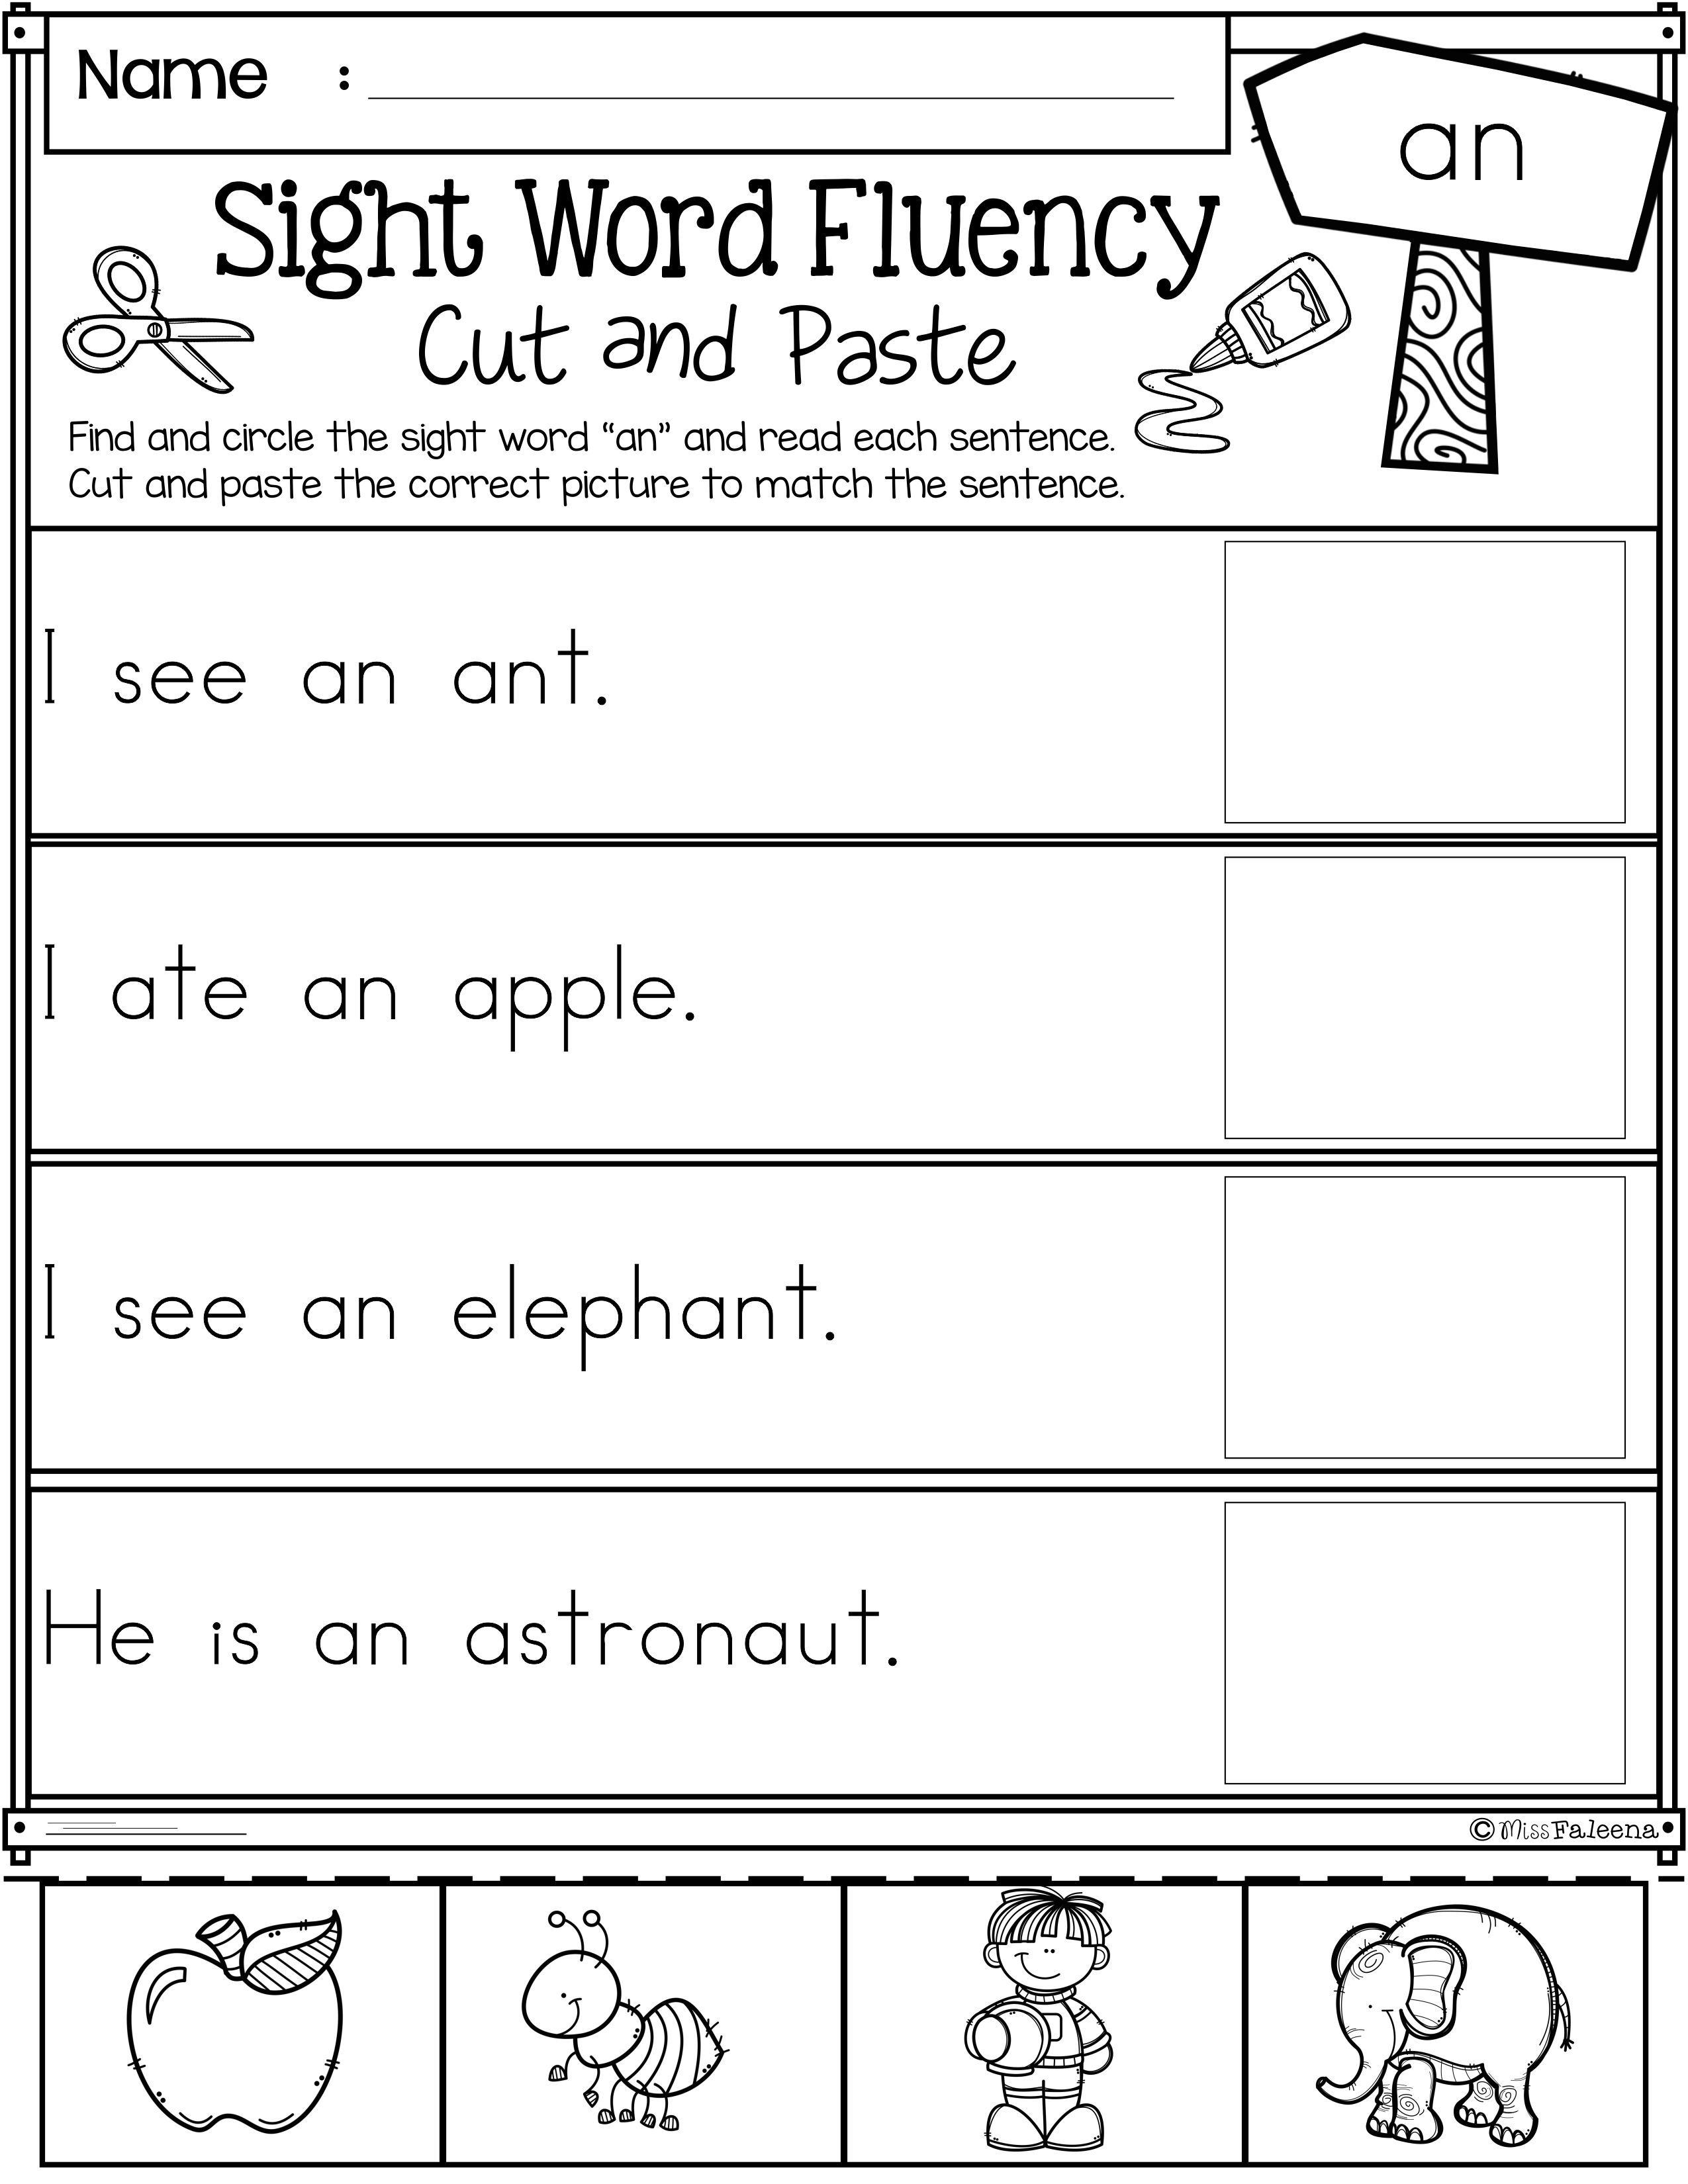 Sentence Strips Printable Worksheet   Printable Worksheets and Activities  for Teachers [ 3300 x 2550 Pixel ]